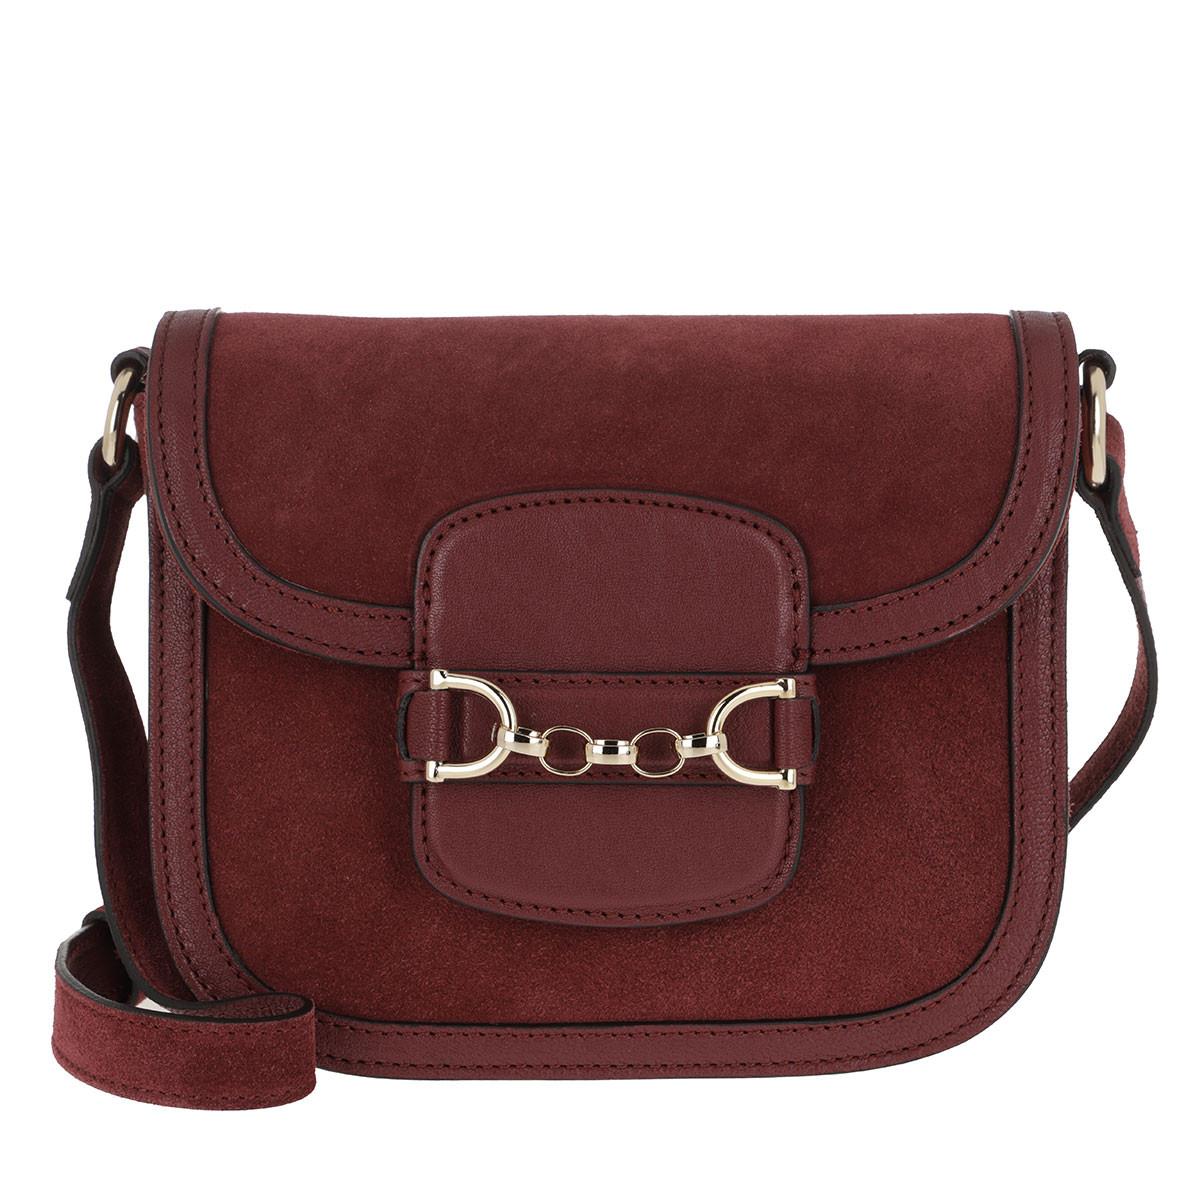 Abro Umhängetasche - Diana Crossboy Bag Small Bordeaux - in rot - für Damen